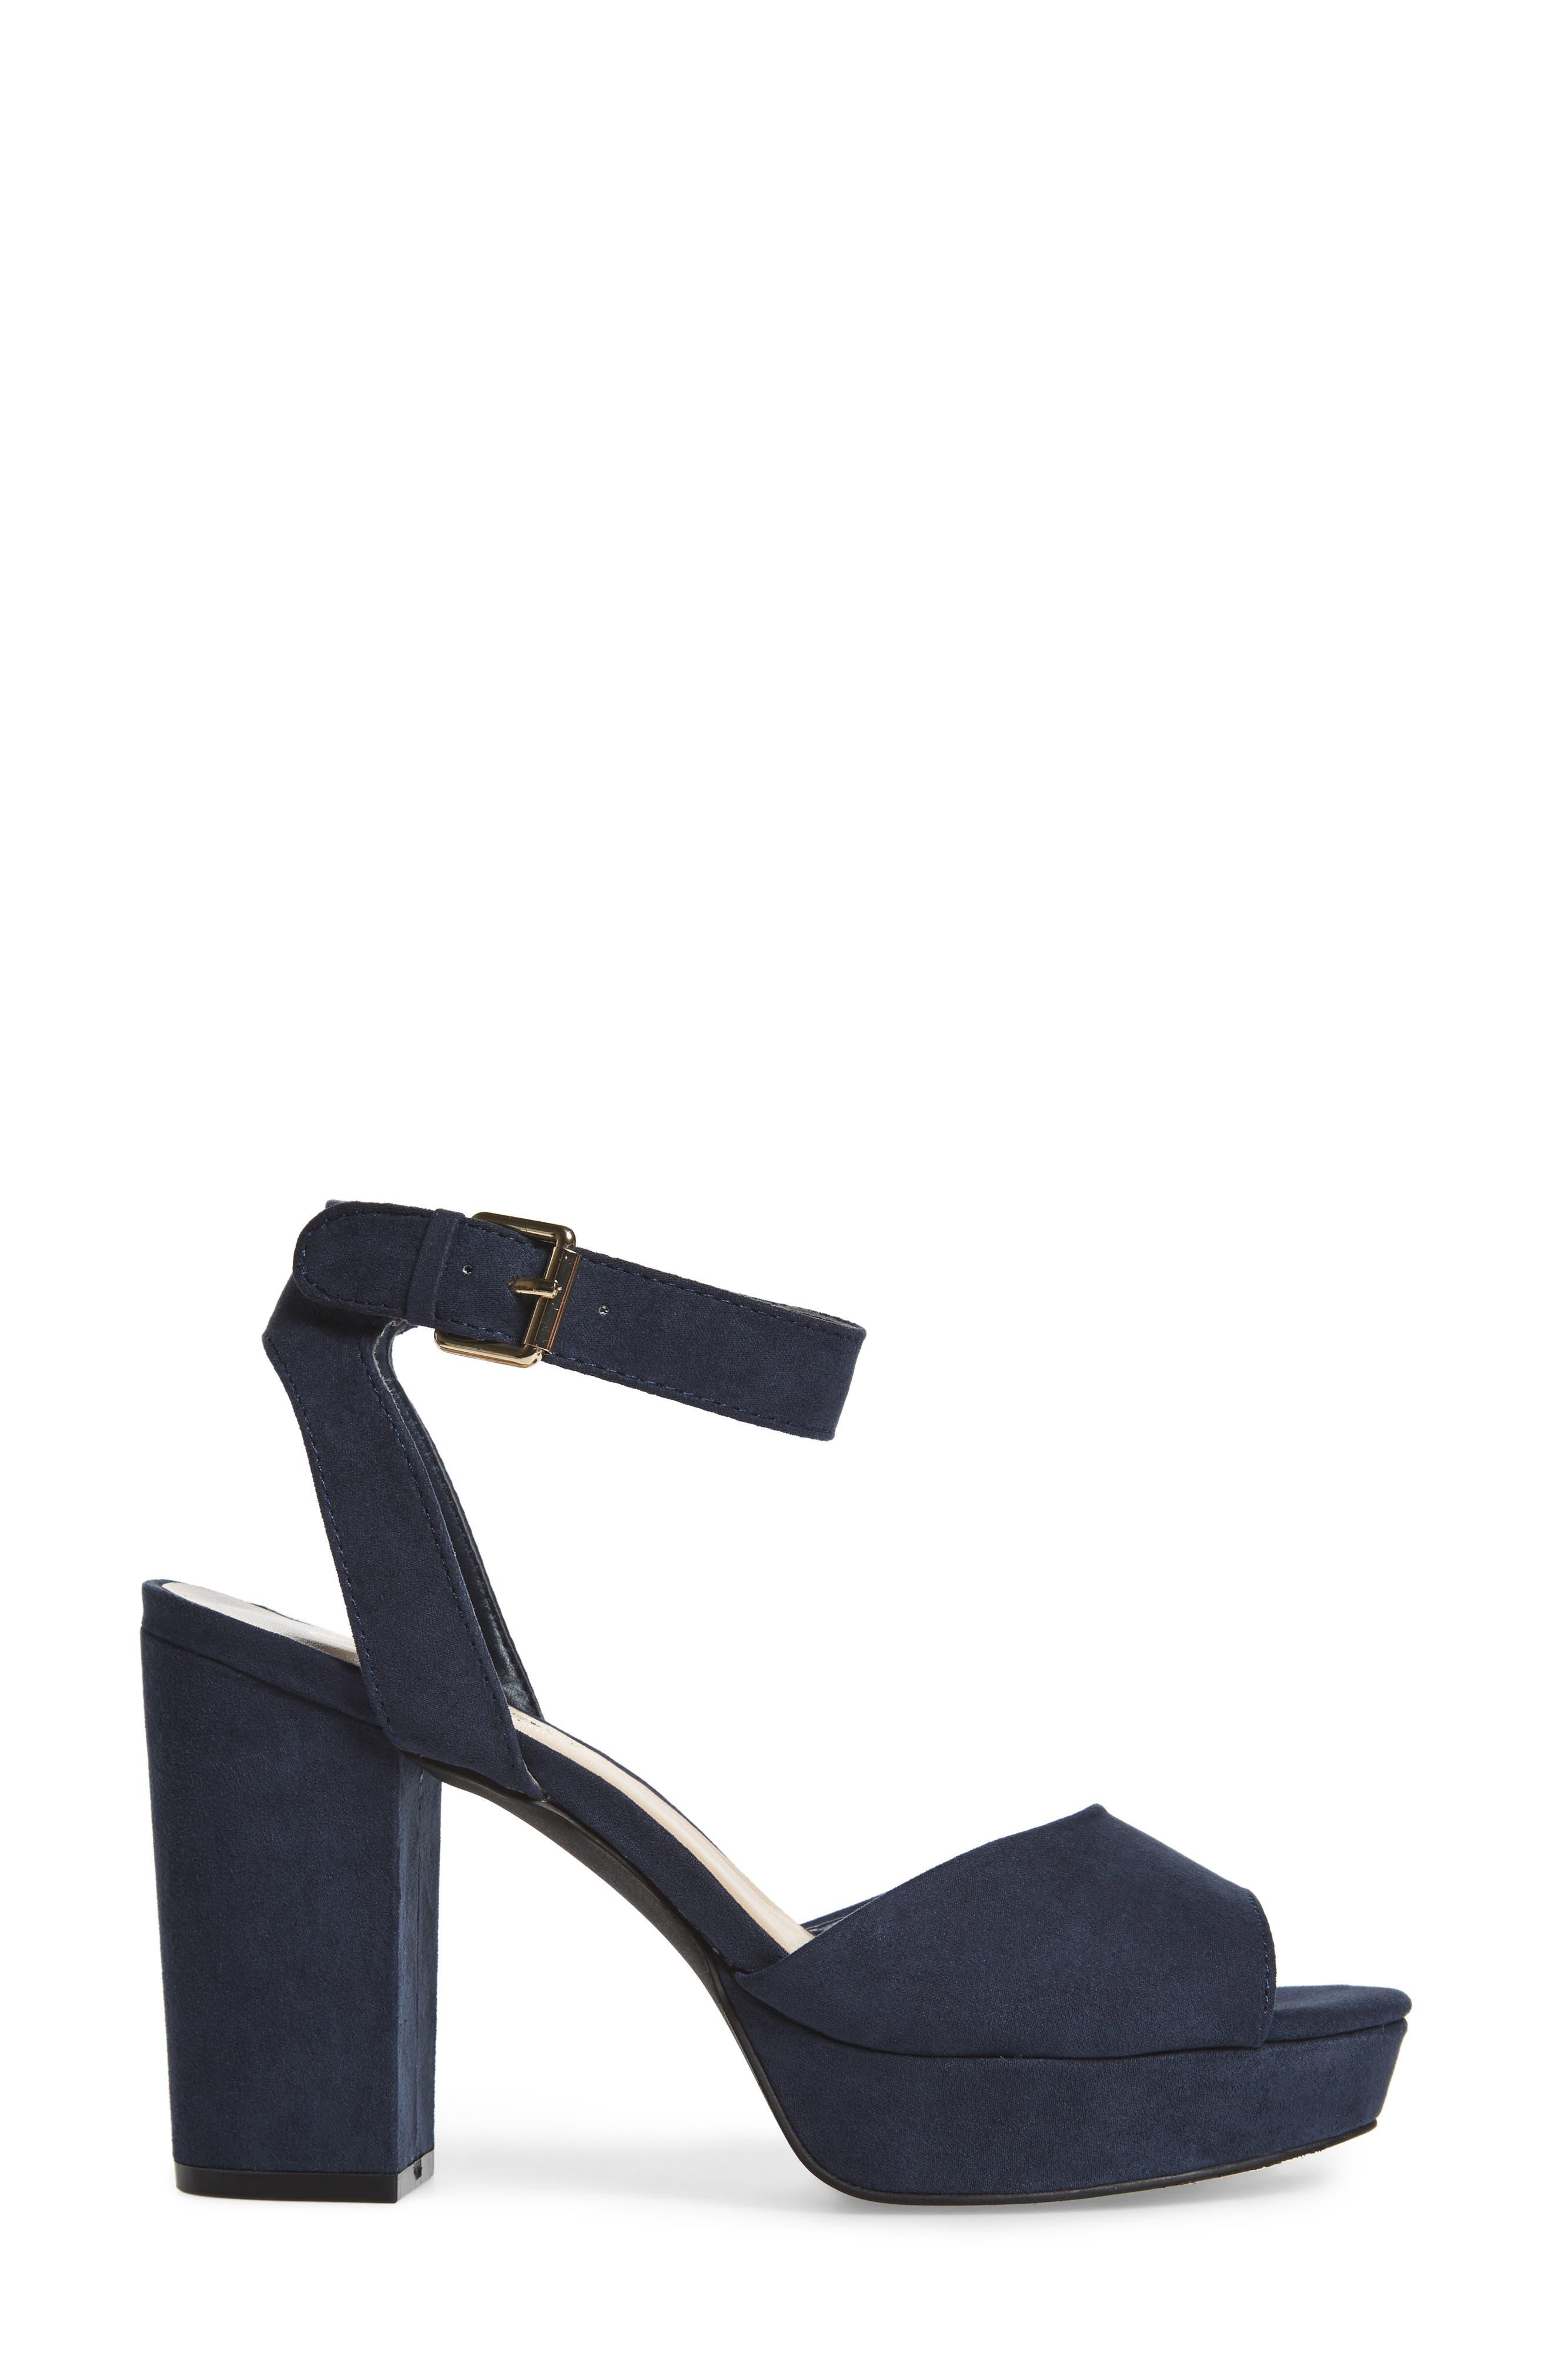 Jerzy Platform Sandal,                             Alternate thumbnail 3, color,                             Navy Synthetic